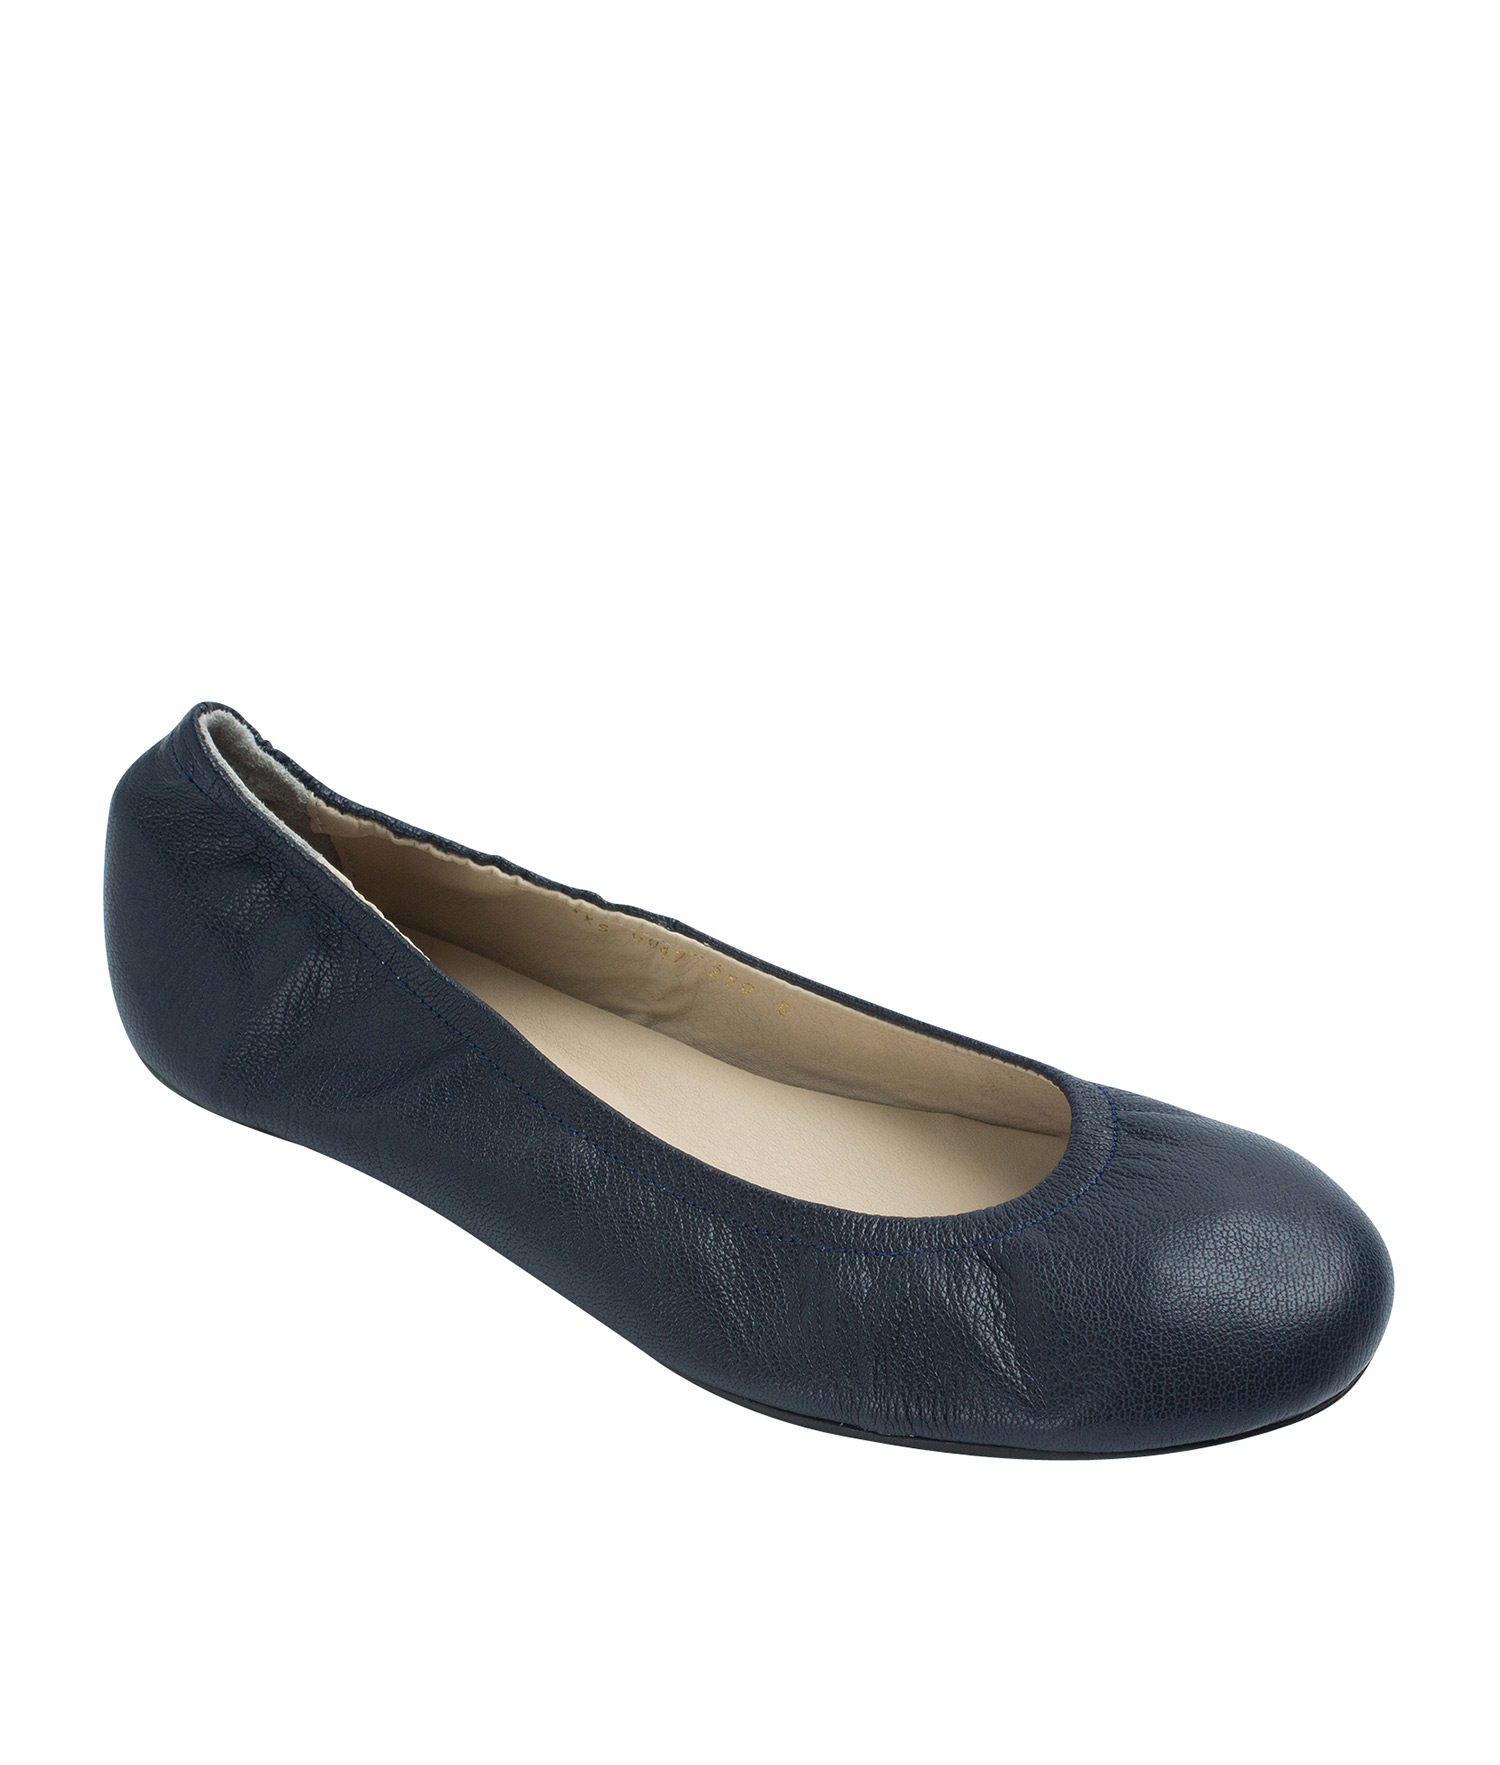 46477115dce7 Sy annakastle womens genuine leather elastic ballerina flats navy jpg  1500x1765 Shoes elastic ballerina flats